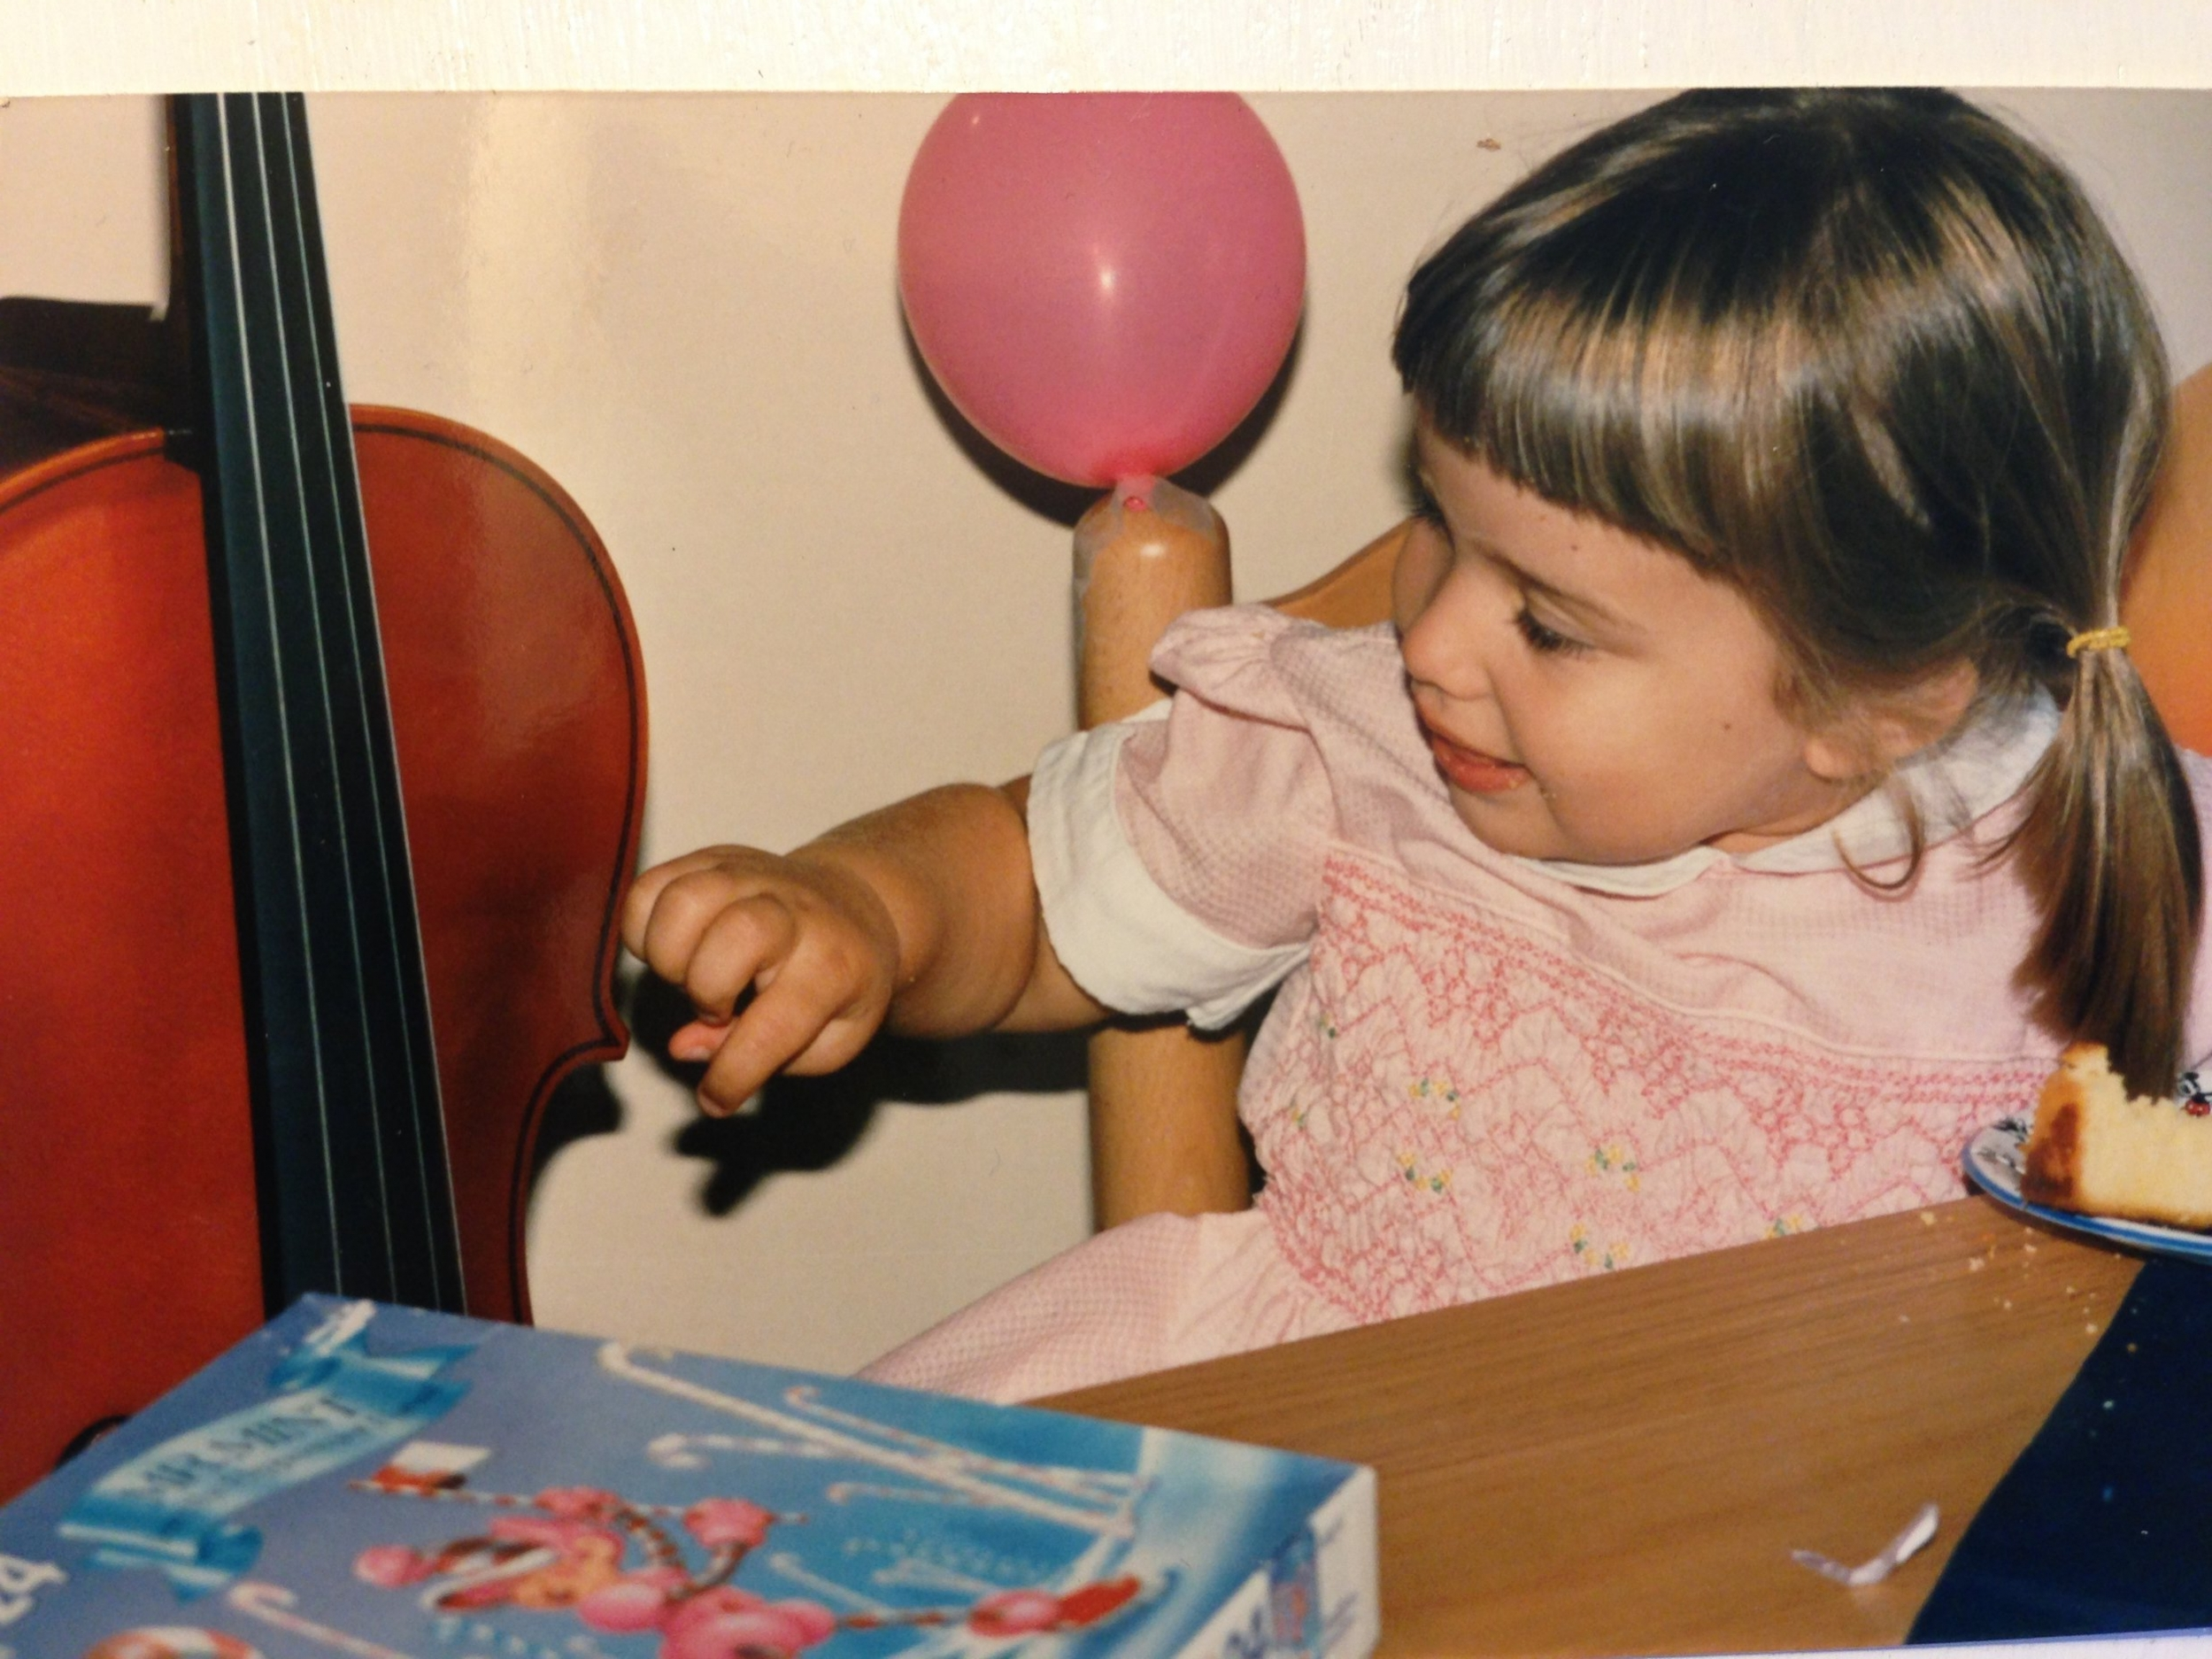 Rachel at her 4th birthday